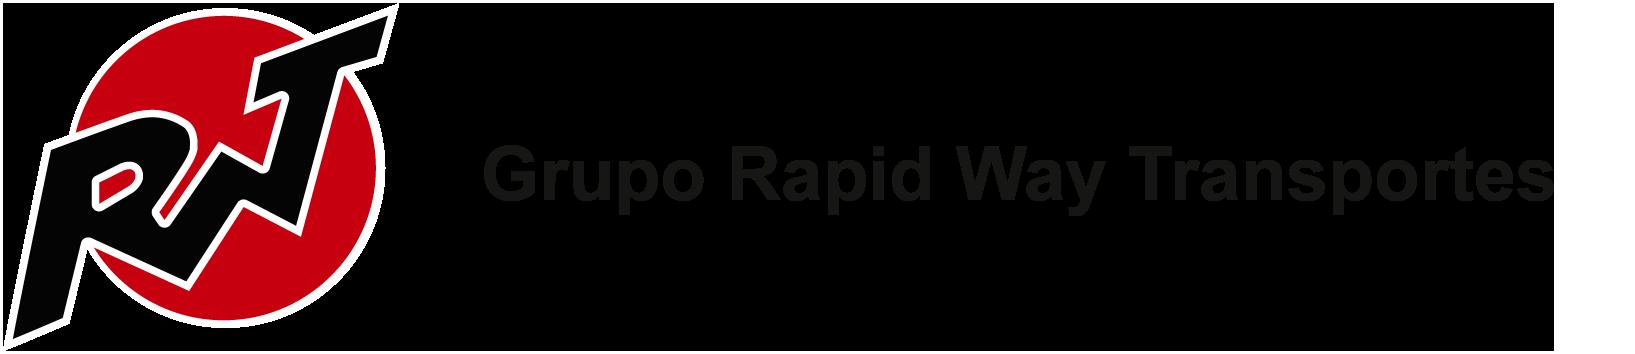 Grupo Rapid Way Transportes